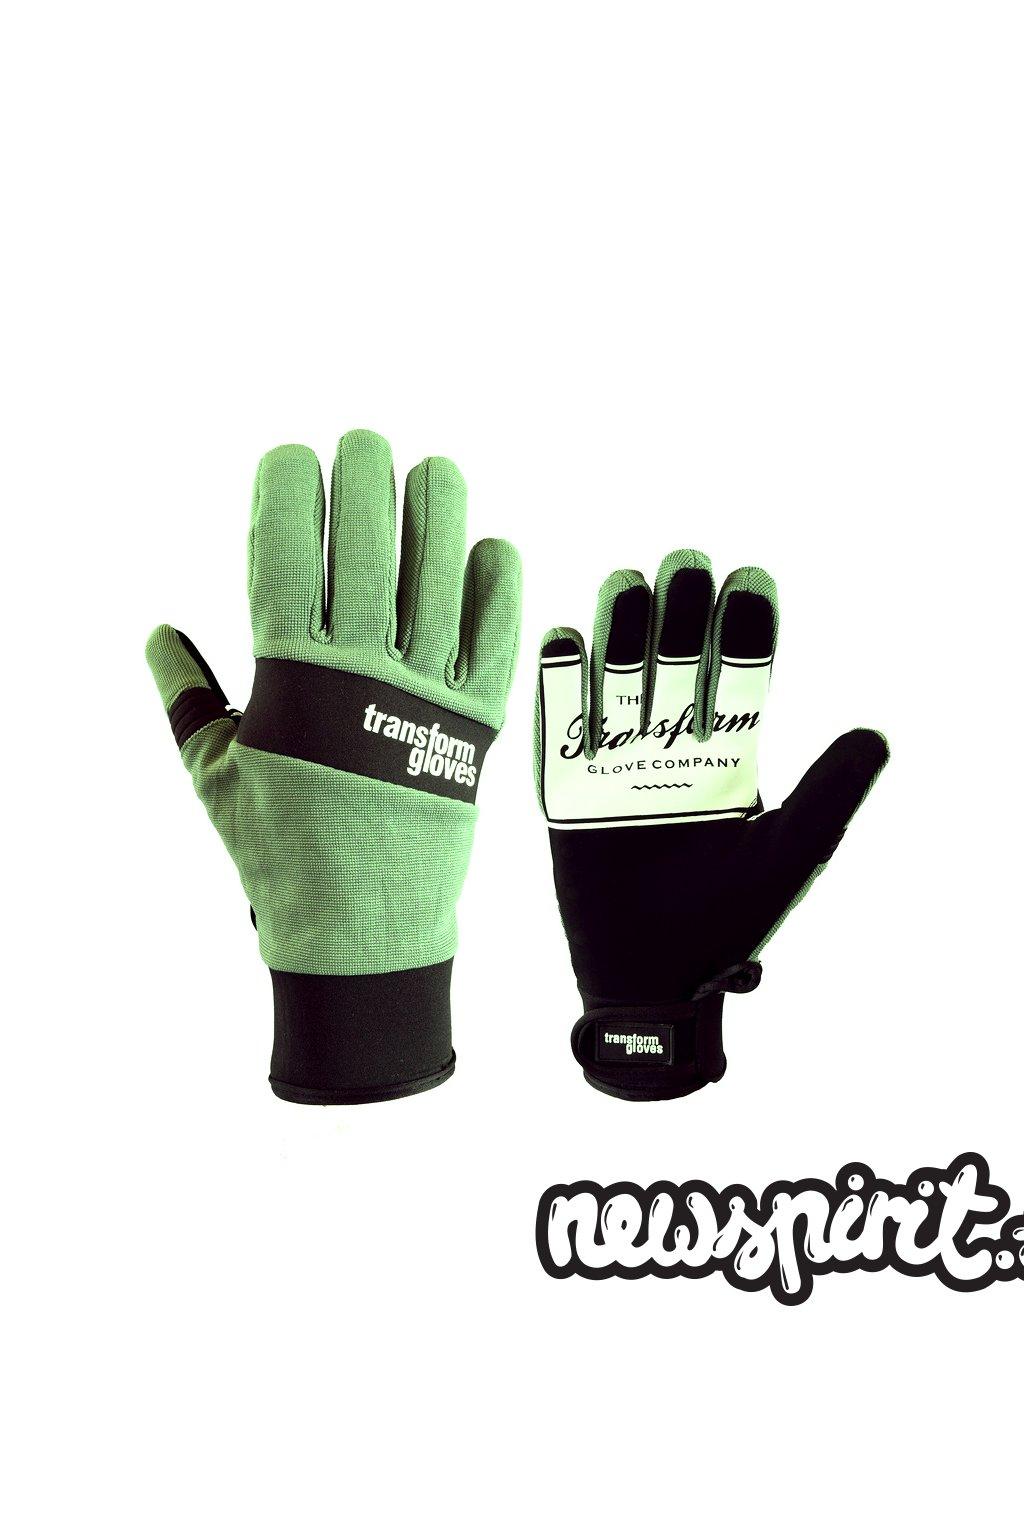 Transform gloves The Watson Green